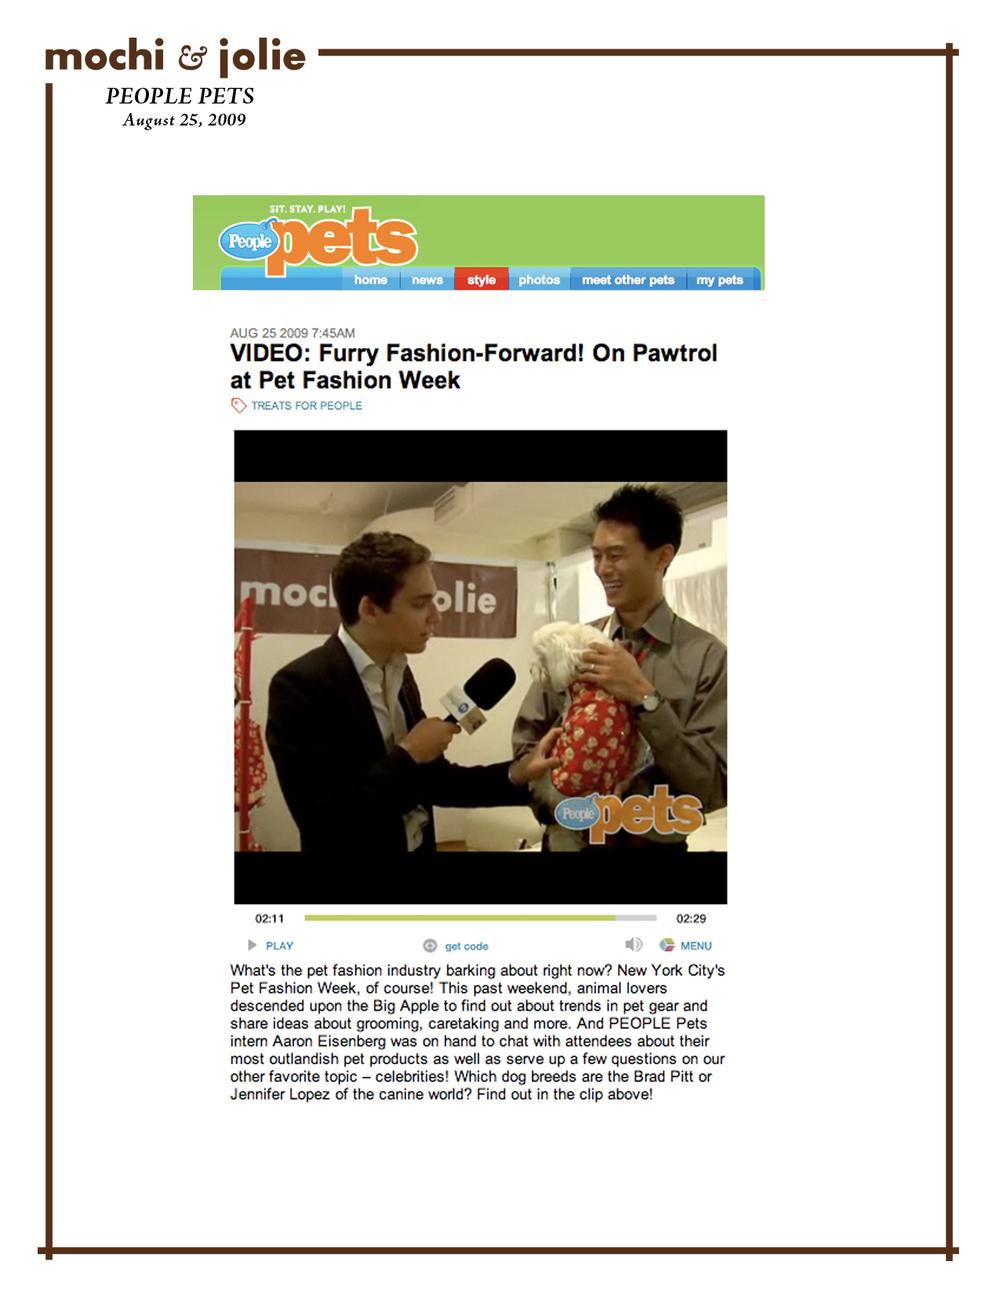 People Pets (August 25, 2009)